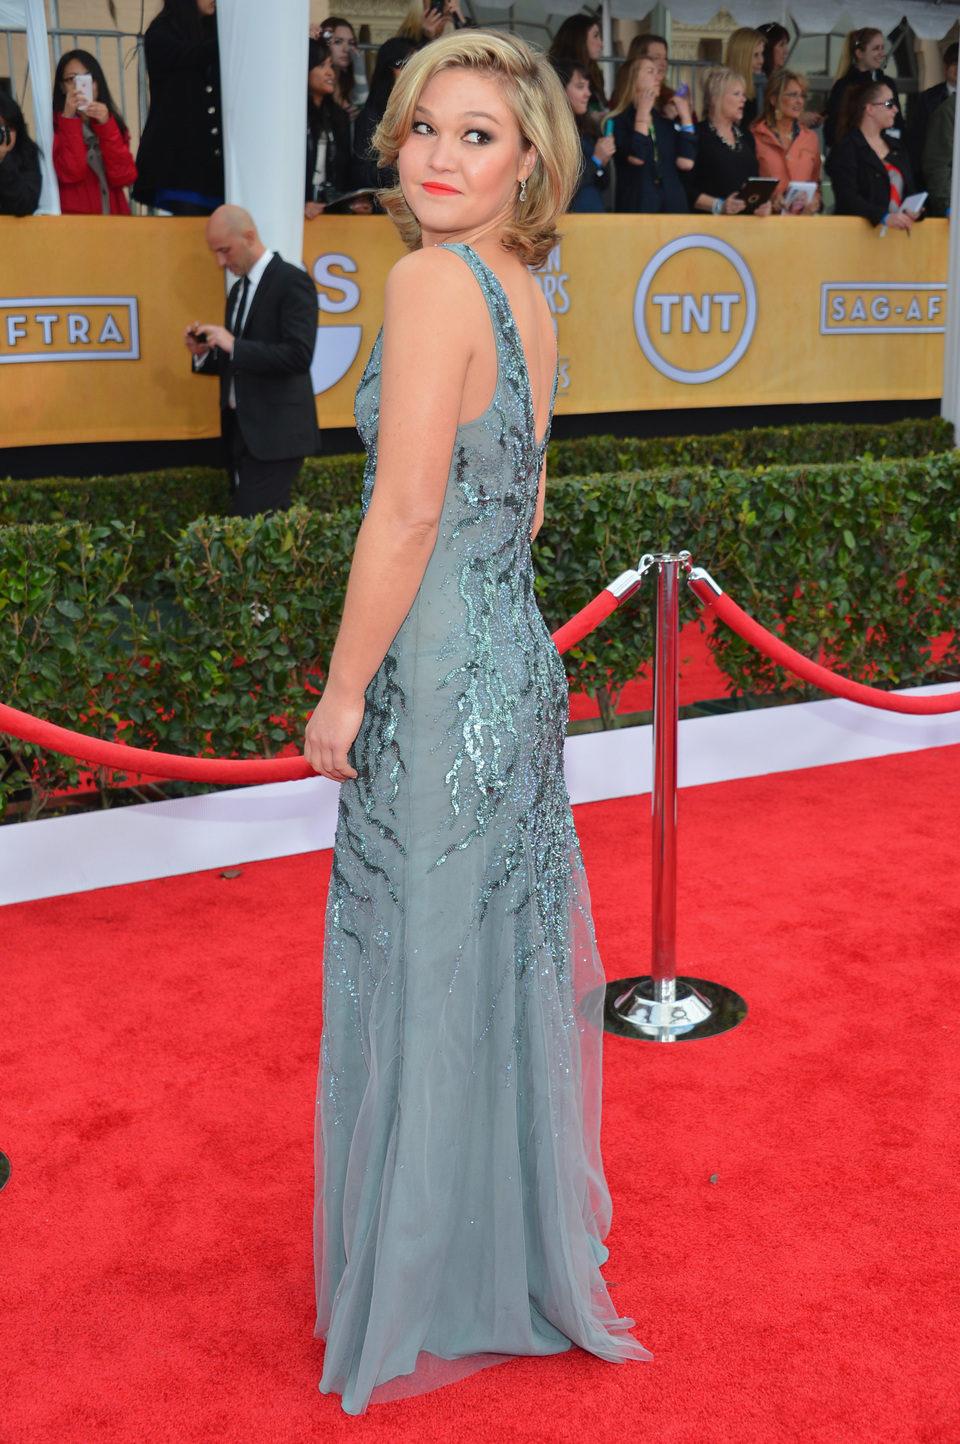 Julia Stiles en la alfombra roja de los Screen Actors Guild Awards 2013